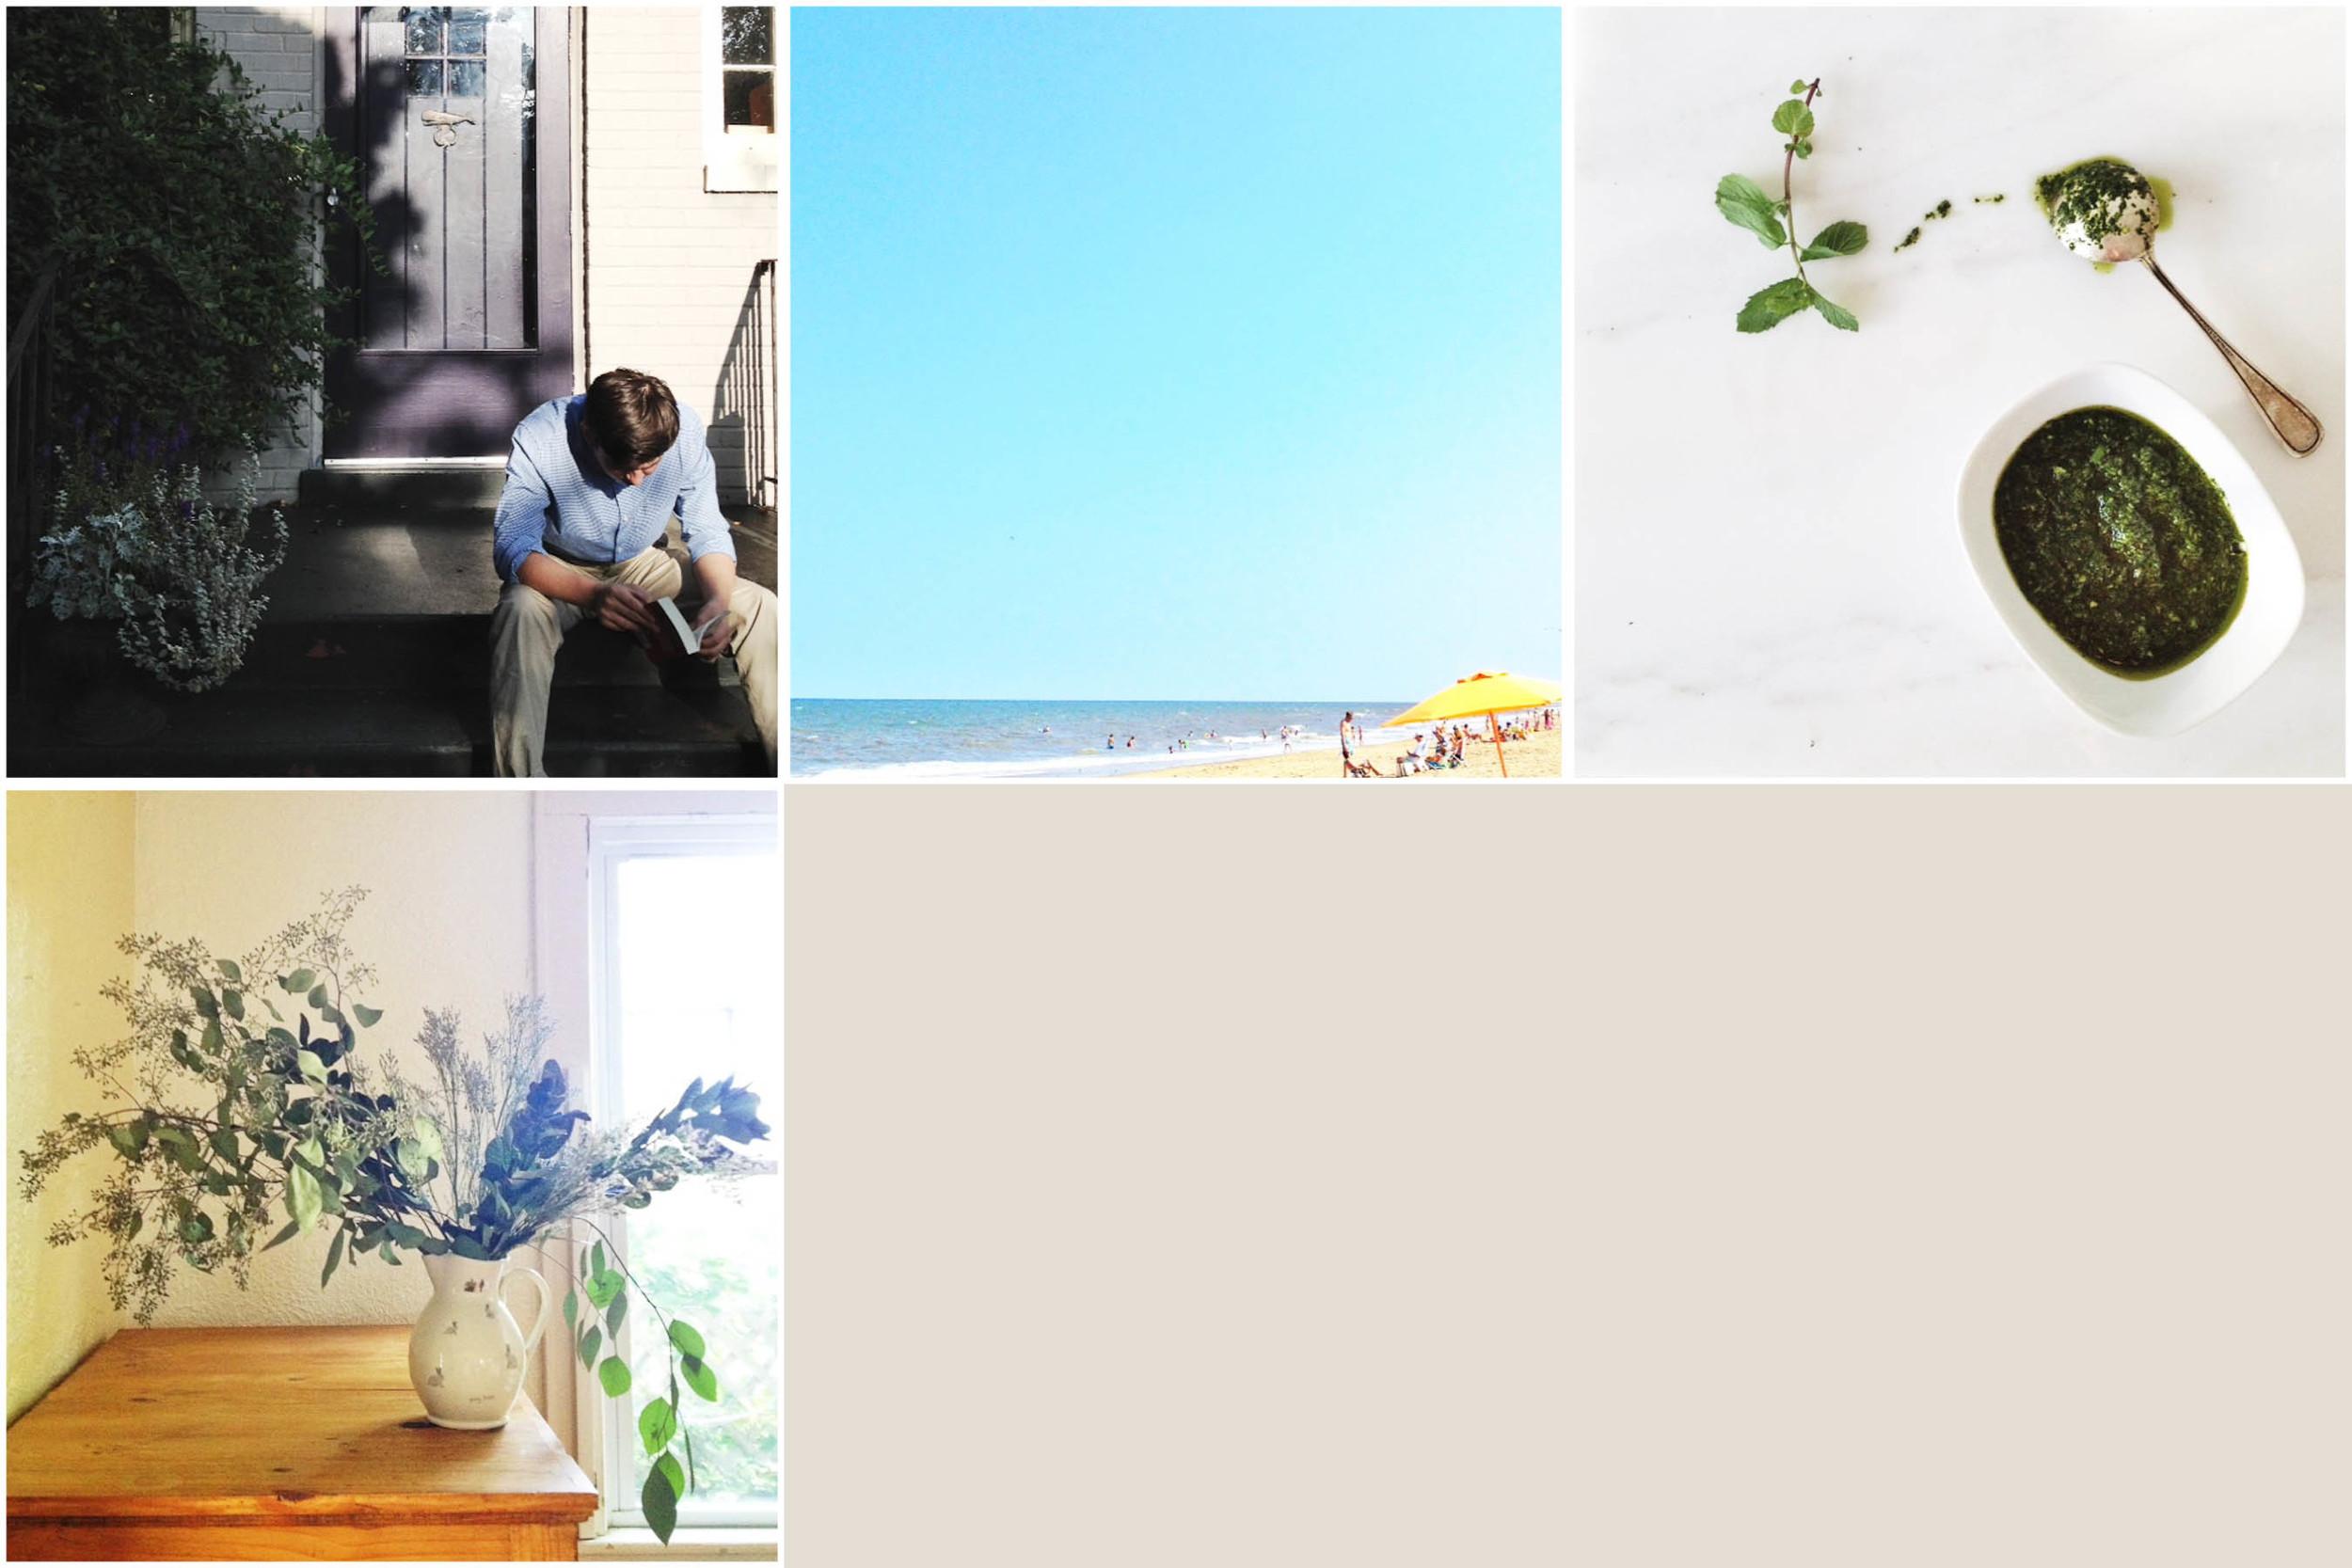 Row 1 : School starts, summer ends; dinner lingers;  Row 2:  Flowers last